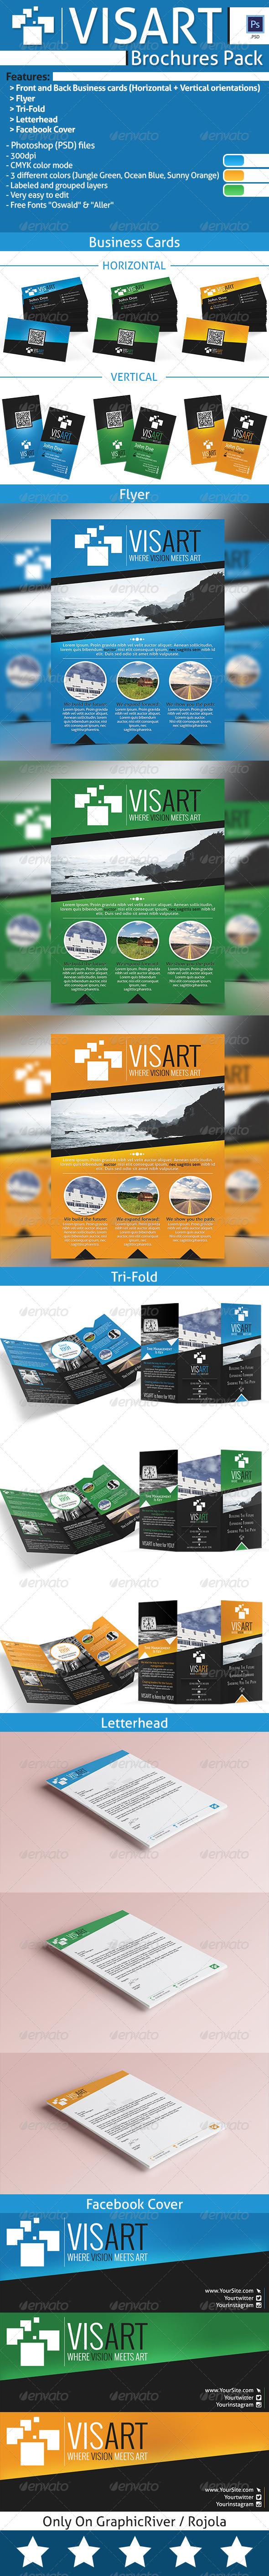 GraphicRiver VISART Brochures Pack Templates 8002072